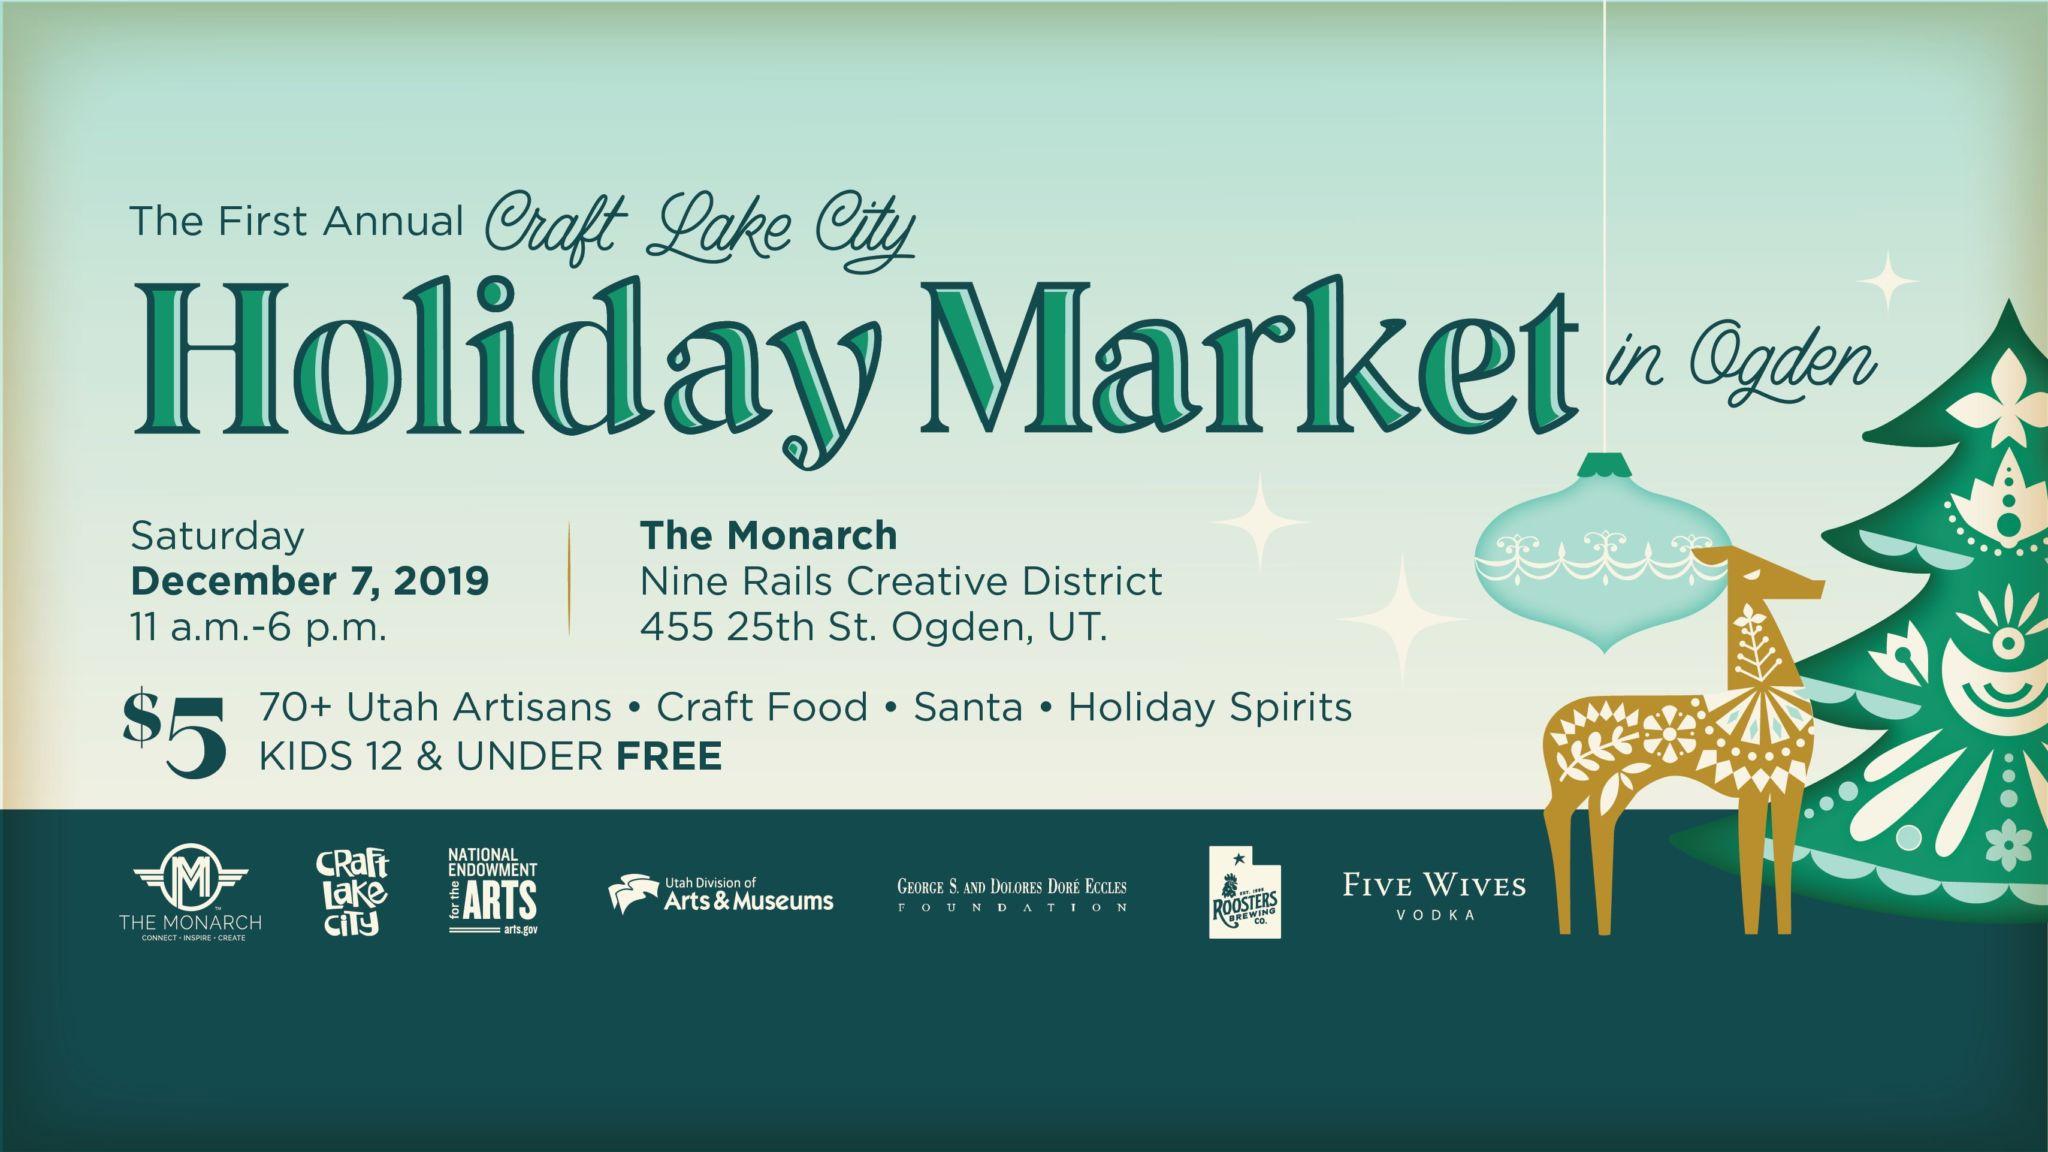 Craft Lake City Holiday Market!